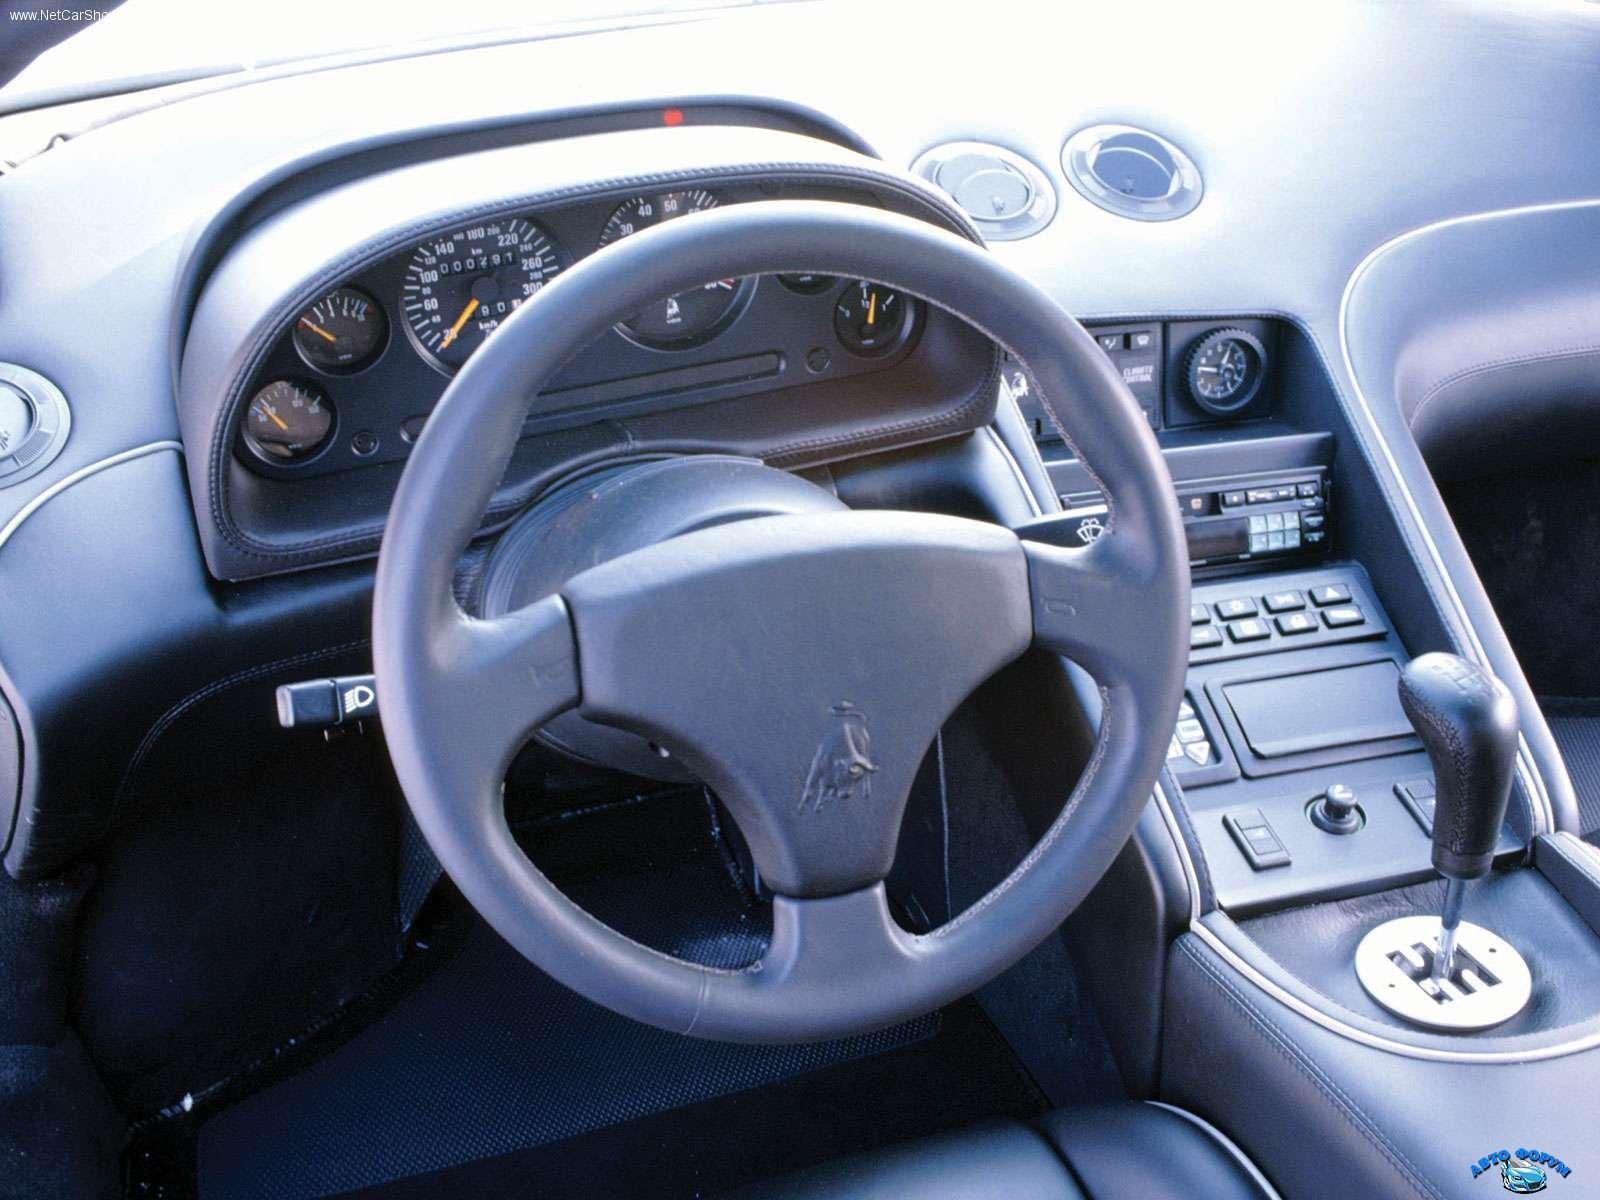 Lamborghini-Diablo_VT_1993_1600x1200_wallpaper_08.jpg